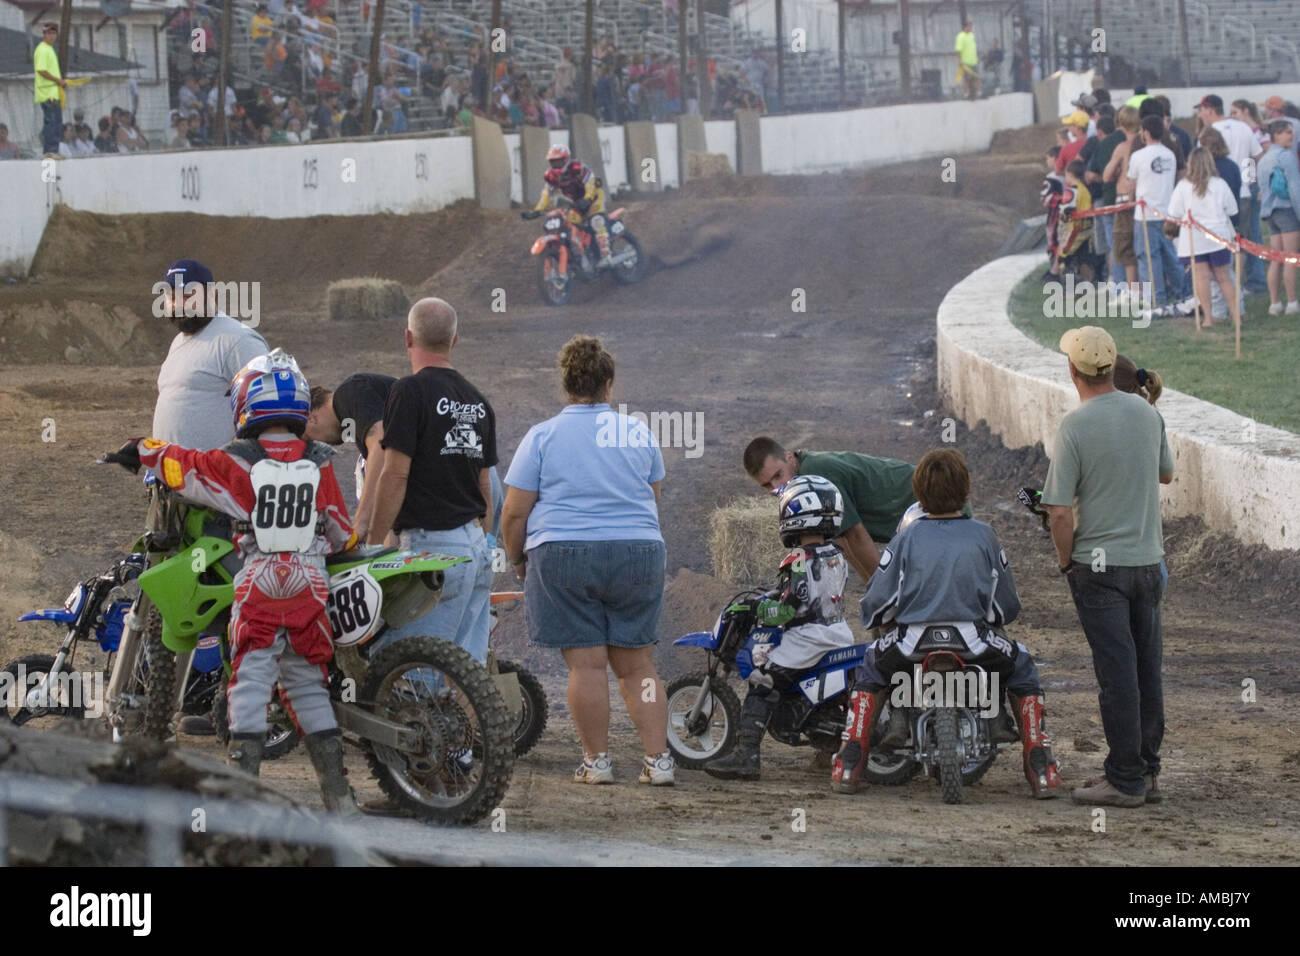 New york montgomery county fonda - Boys Race Motocross Fonda Fair Montgomery County New York